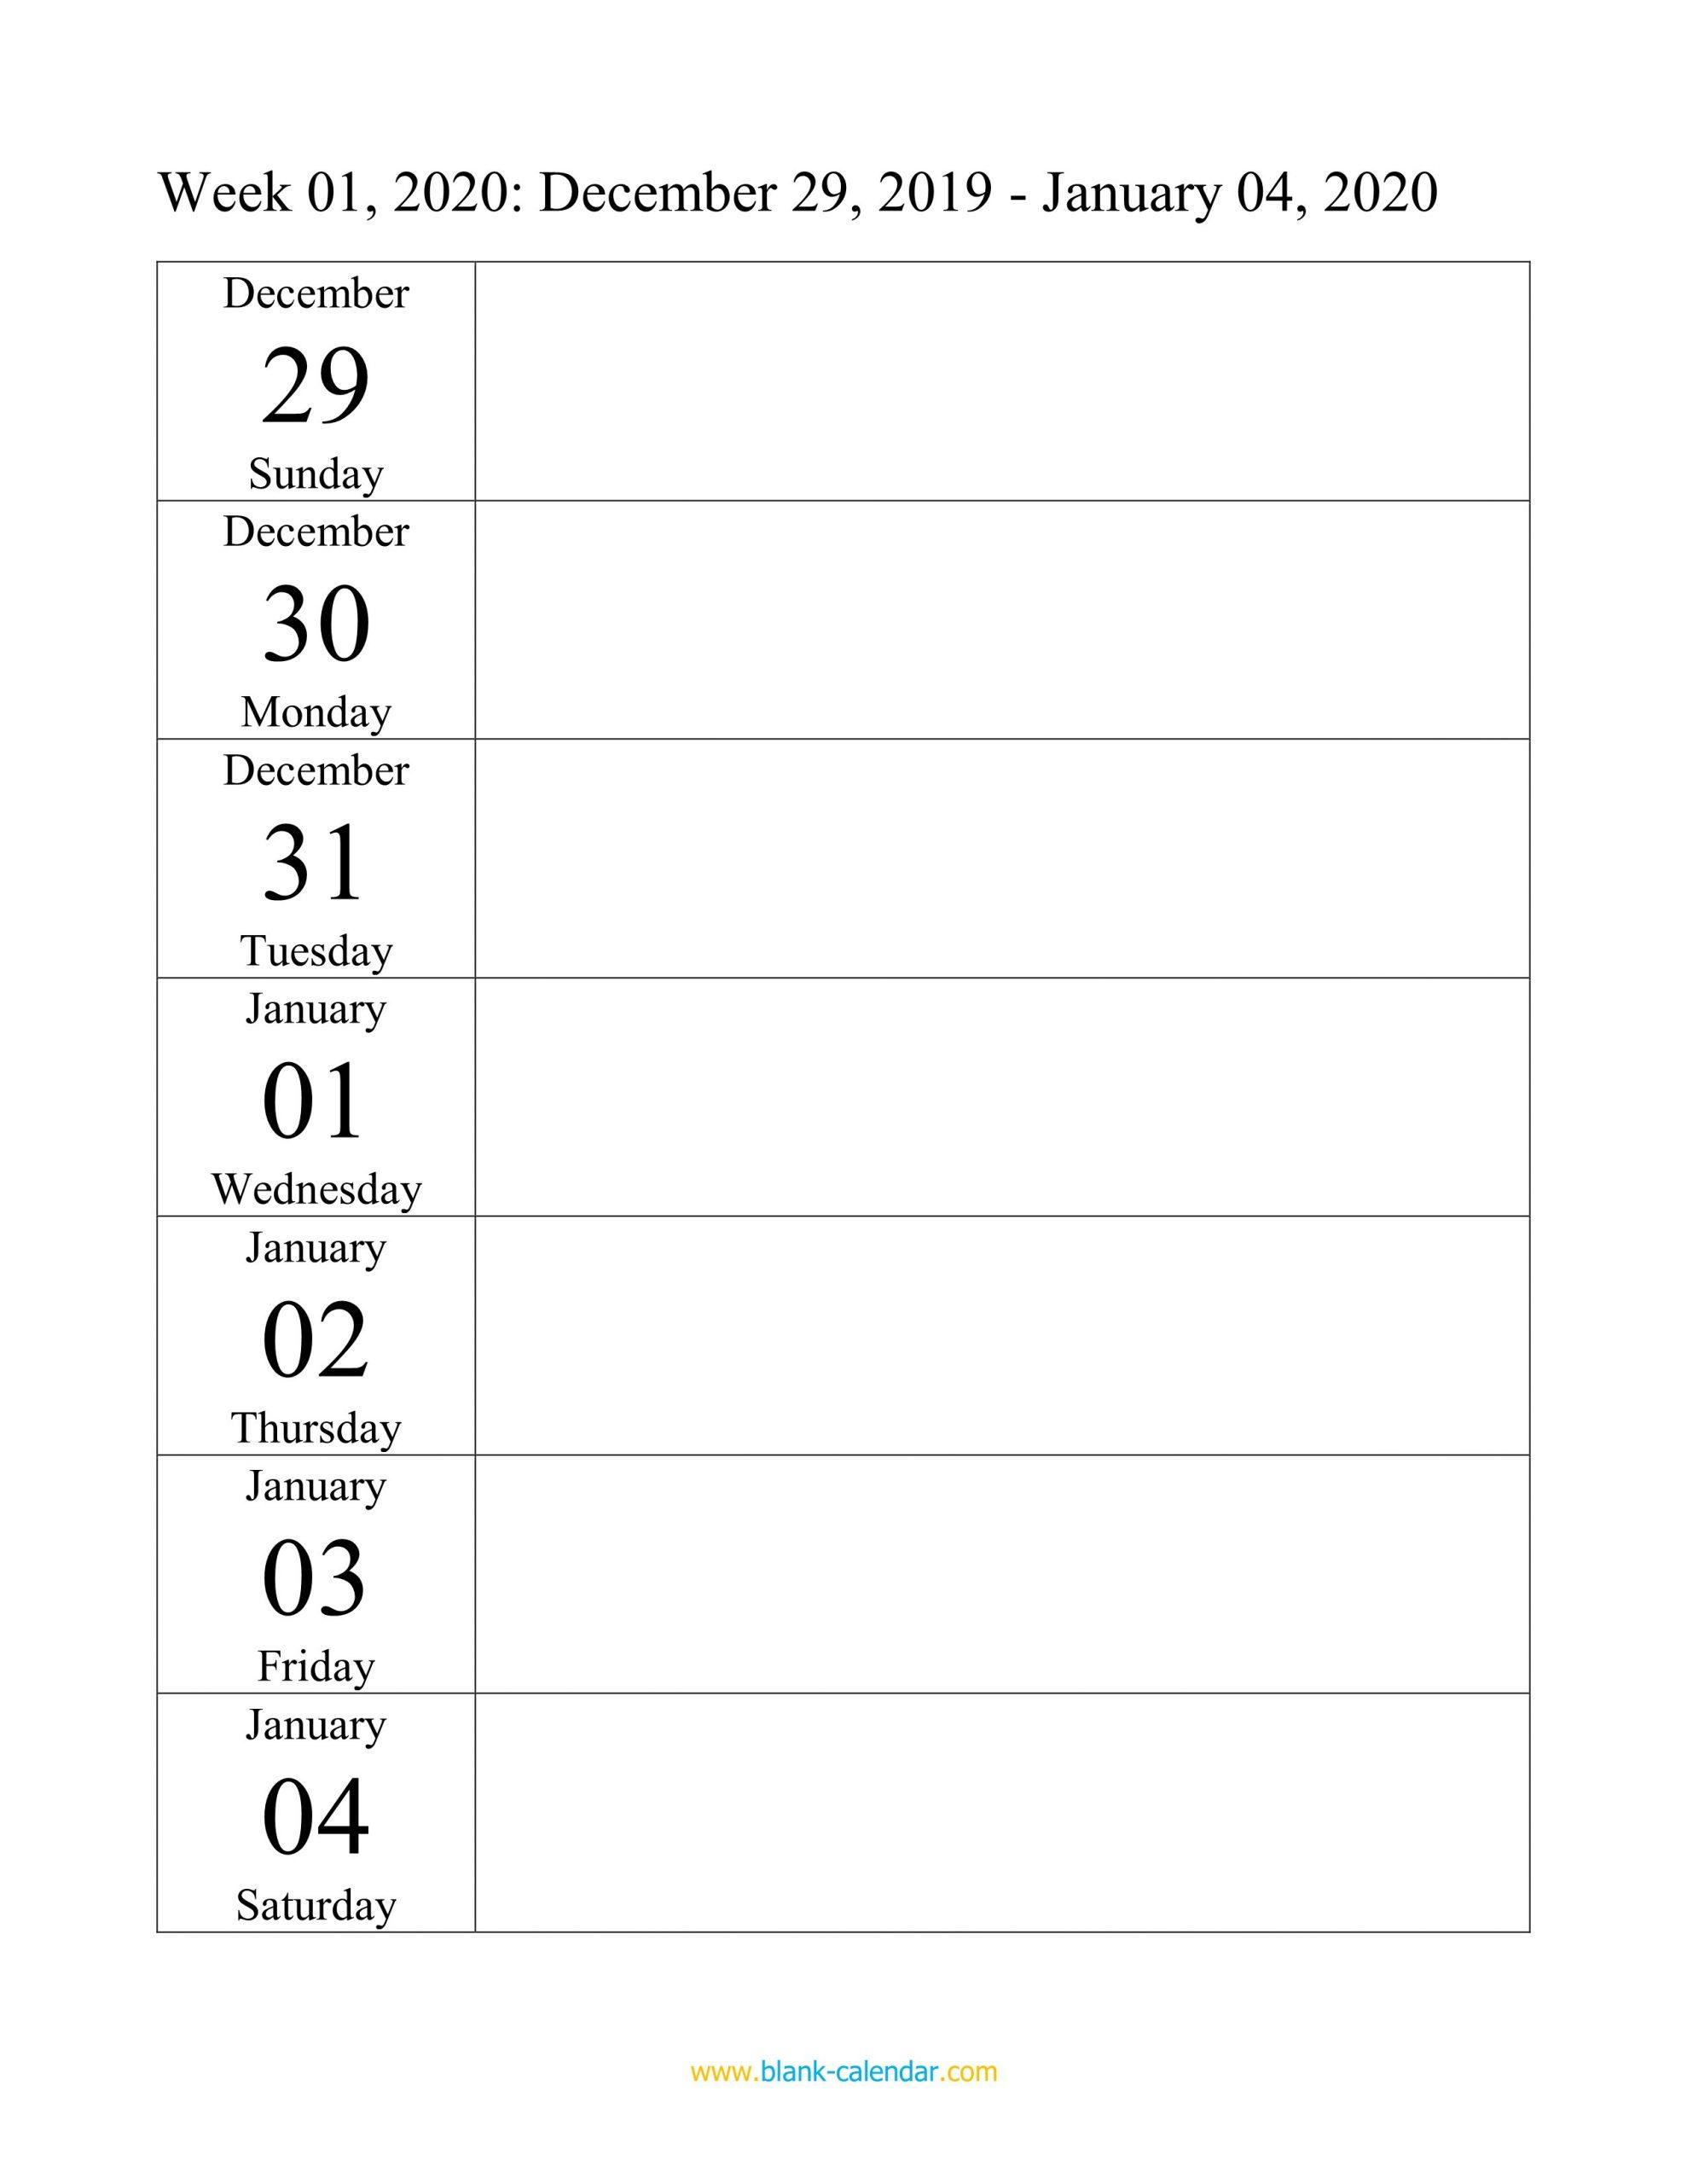 Weekly Calendar 2020 (Word, Excel, Pdf) Printable 2020 Calendar Free Saturday To Friday